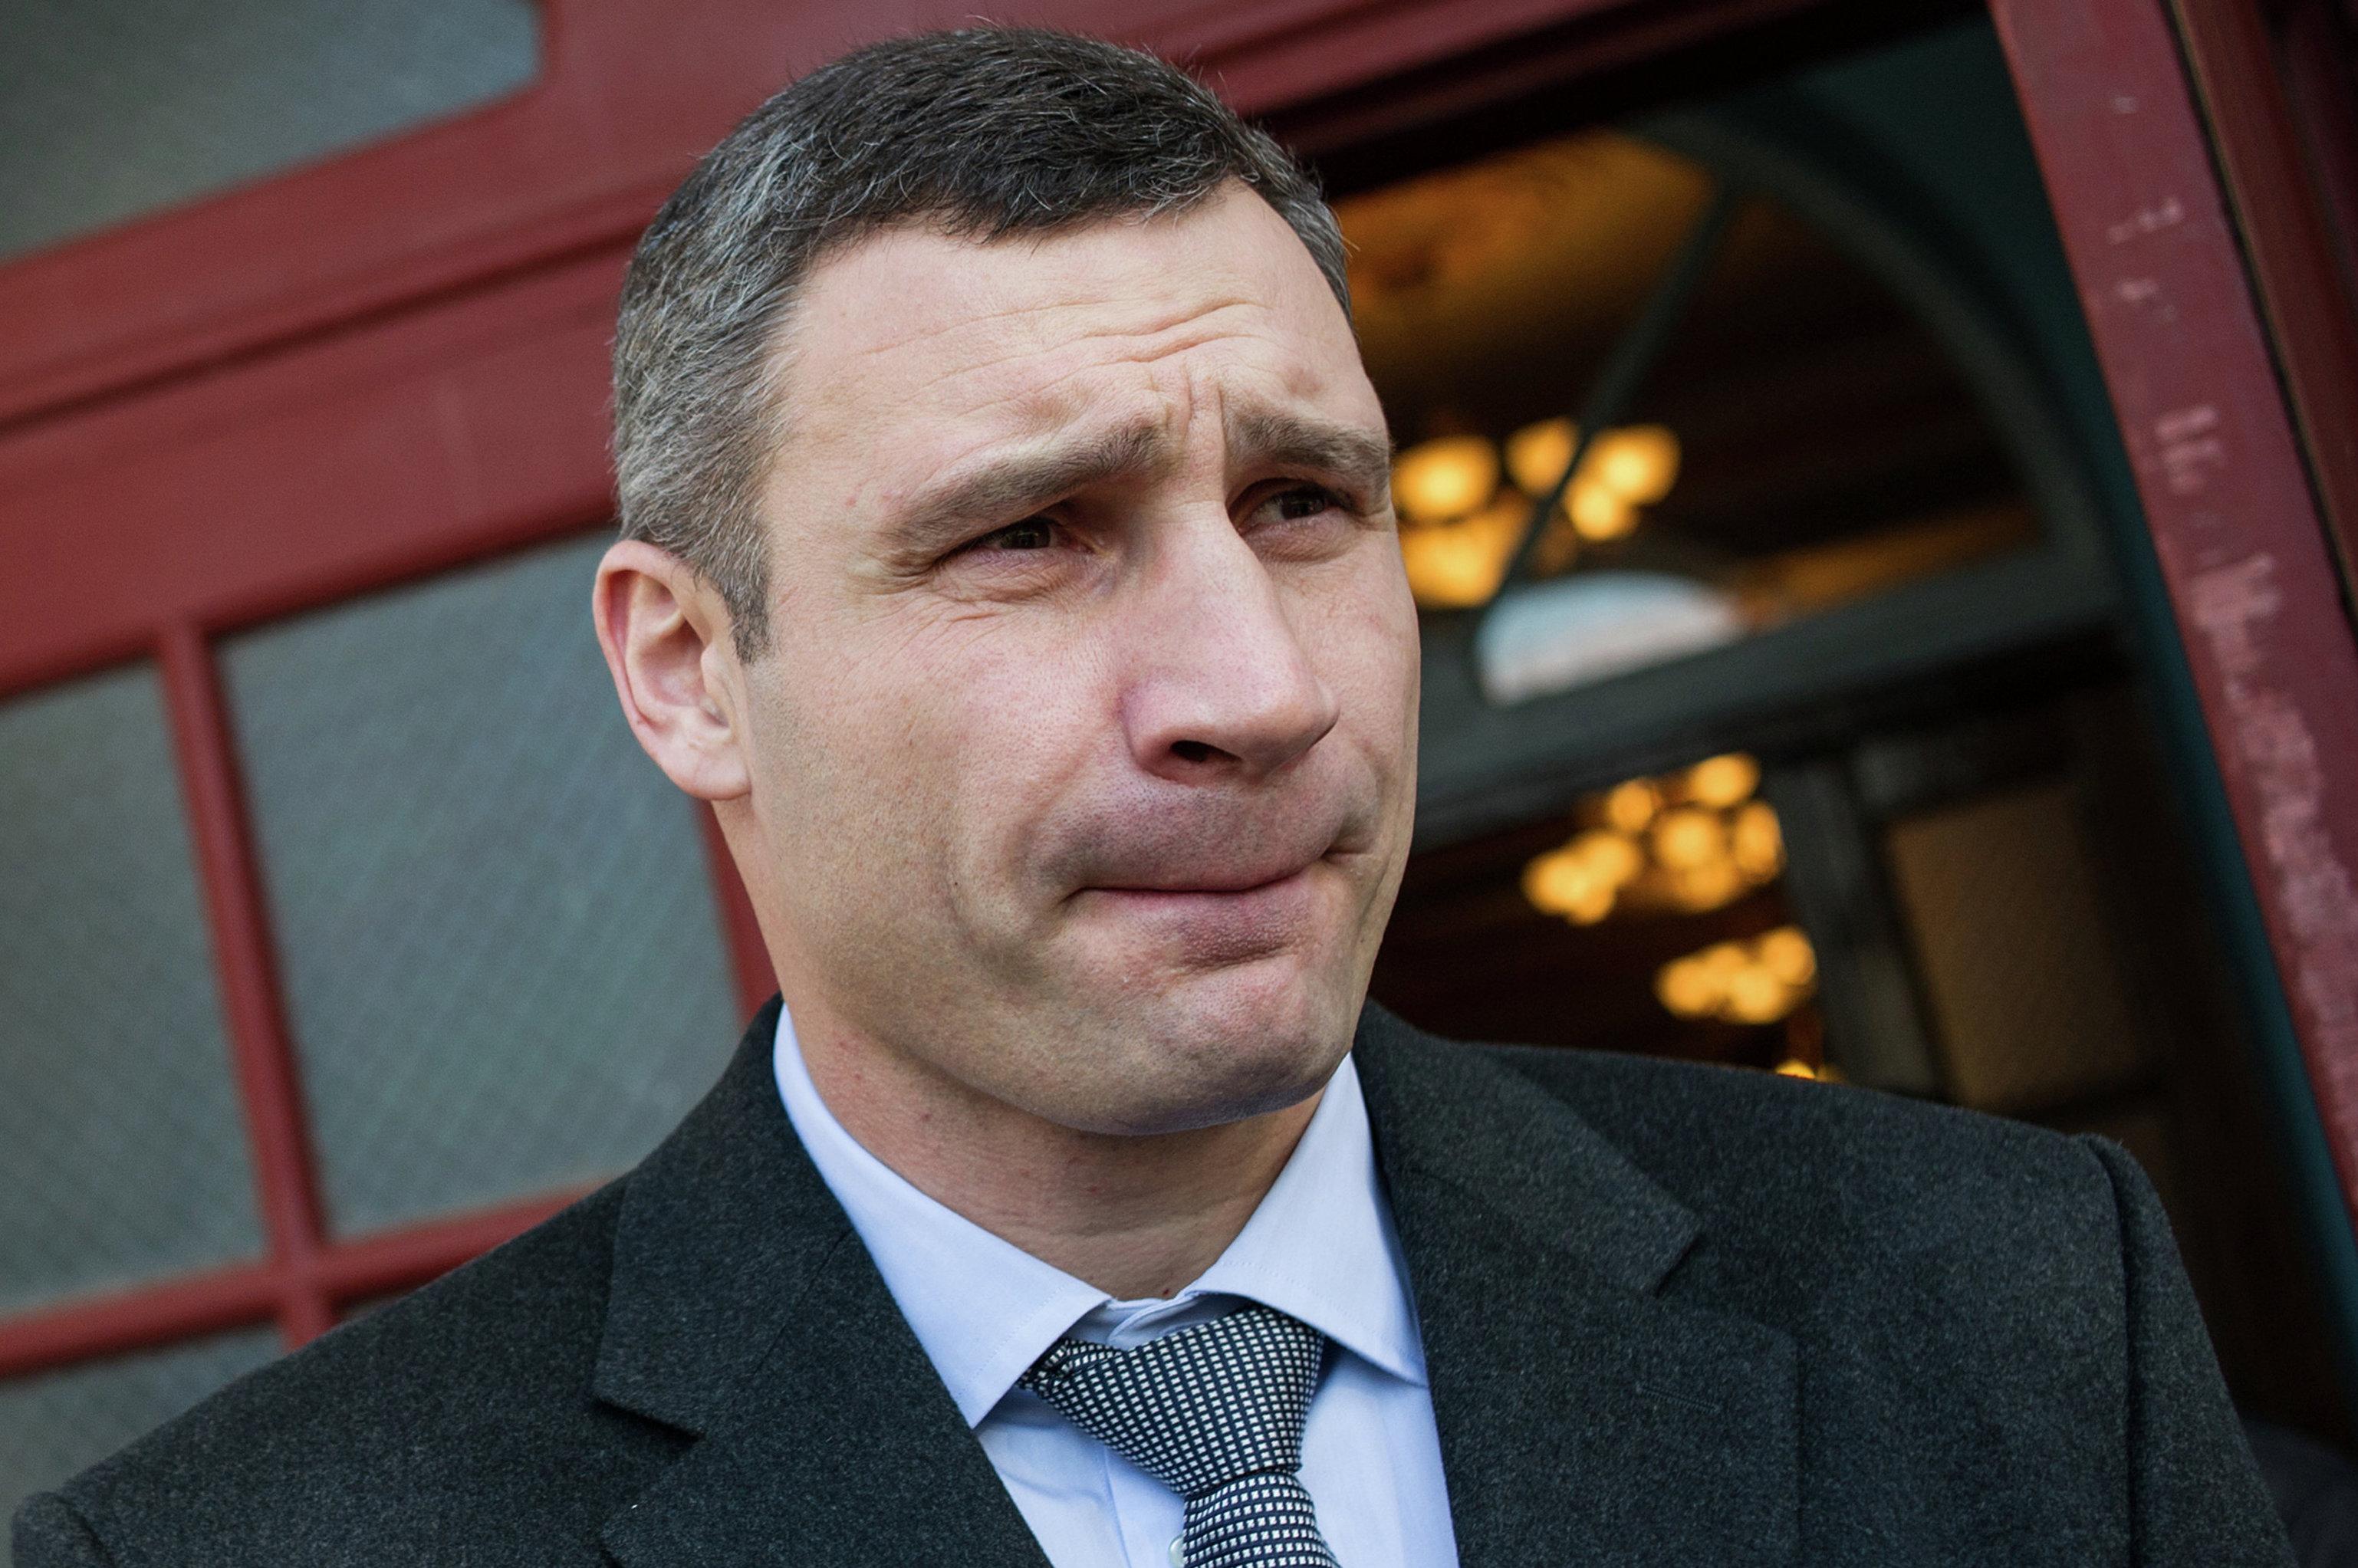 Против мэра Киева Кличко возбудили дело о госизмене